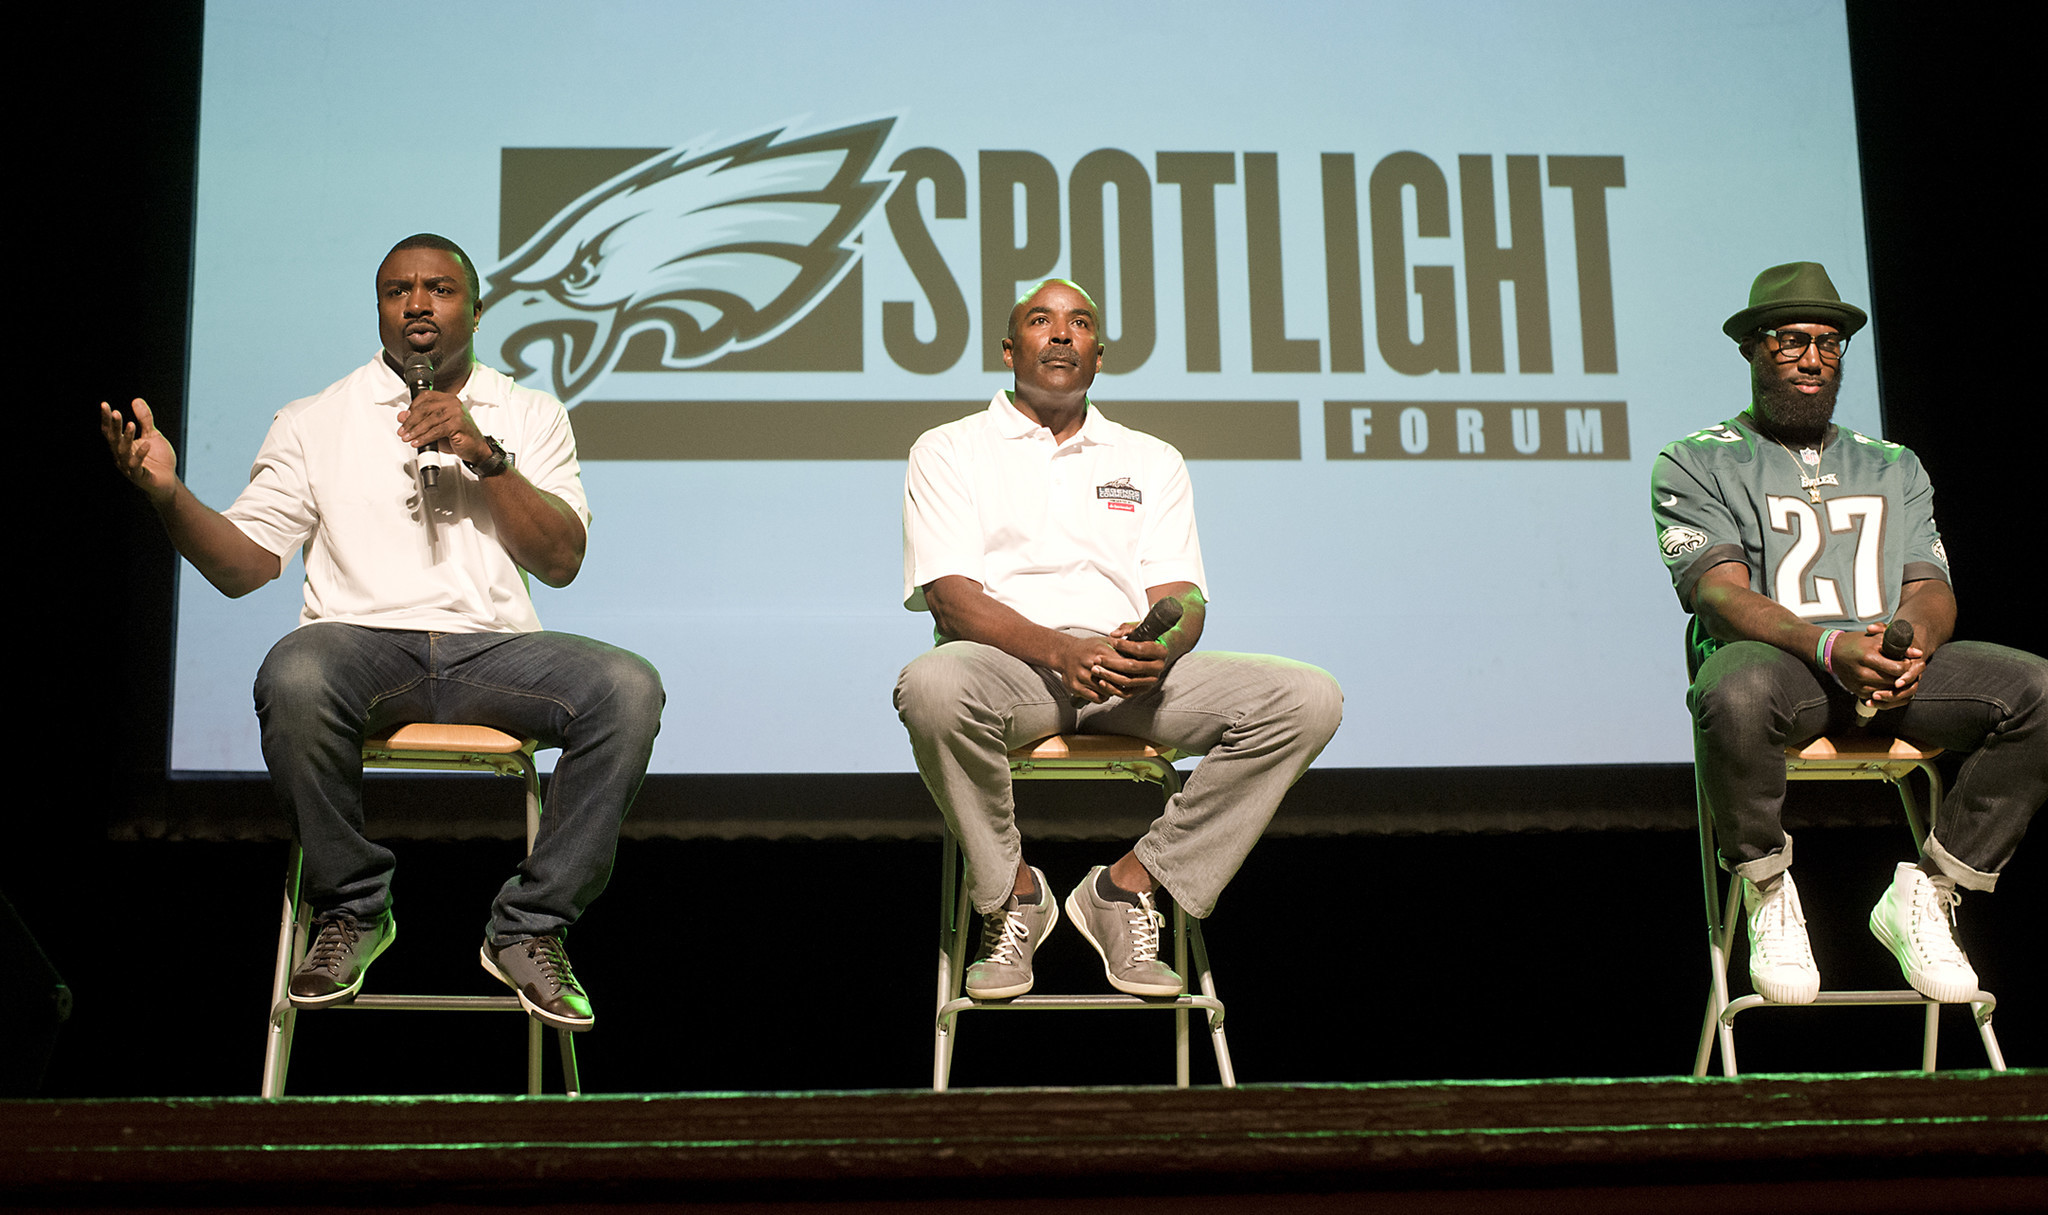 WATCH: Philadelphia Eagles hold meet & greet - The Morning Call